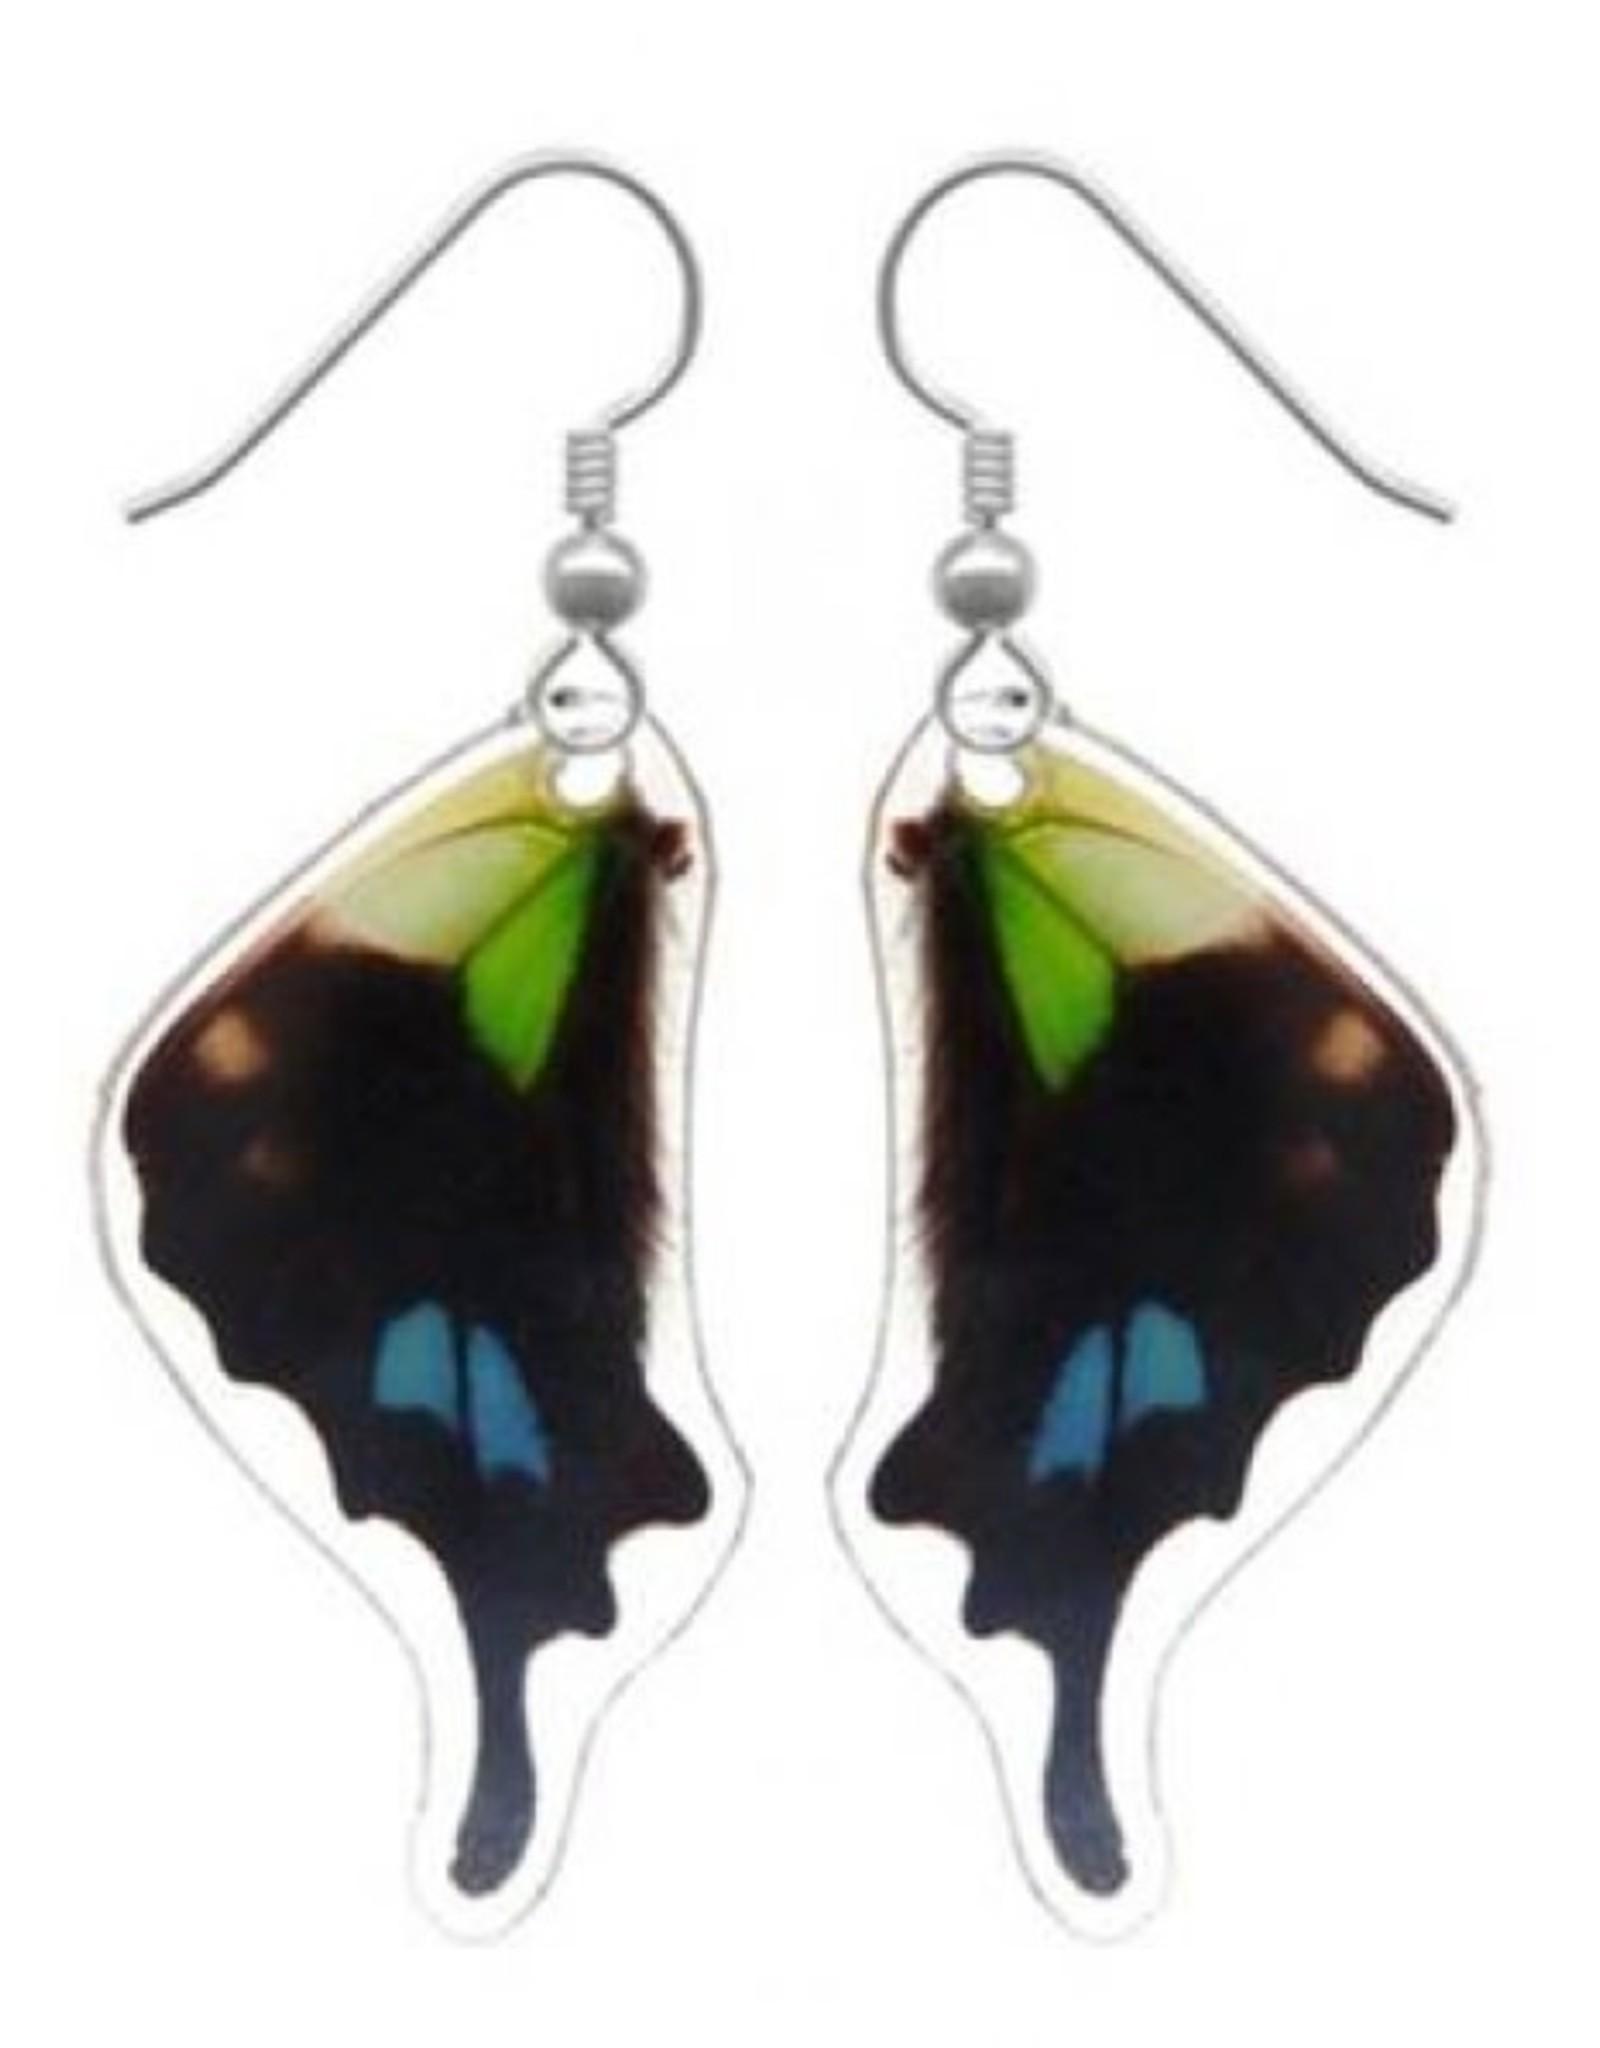 Asana Natural Arts Graphium Weiskei Bottom Wing Earrings,  Resin Coated - Asana Natural Arts